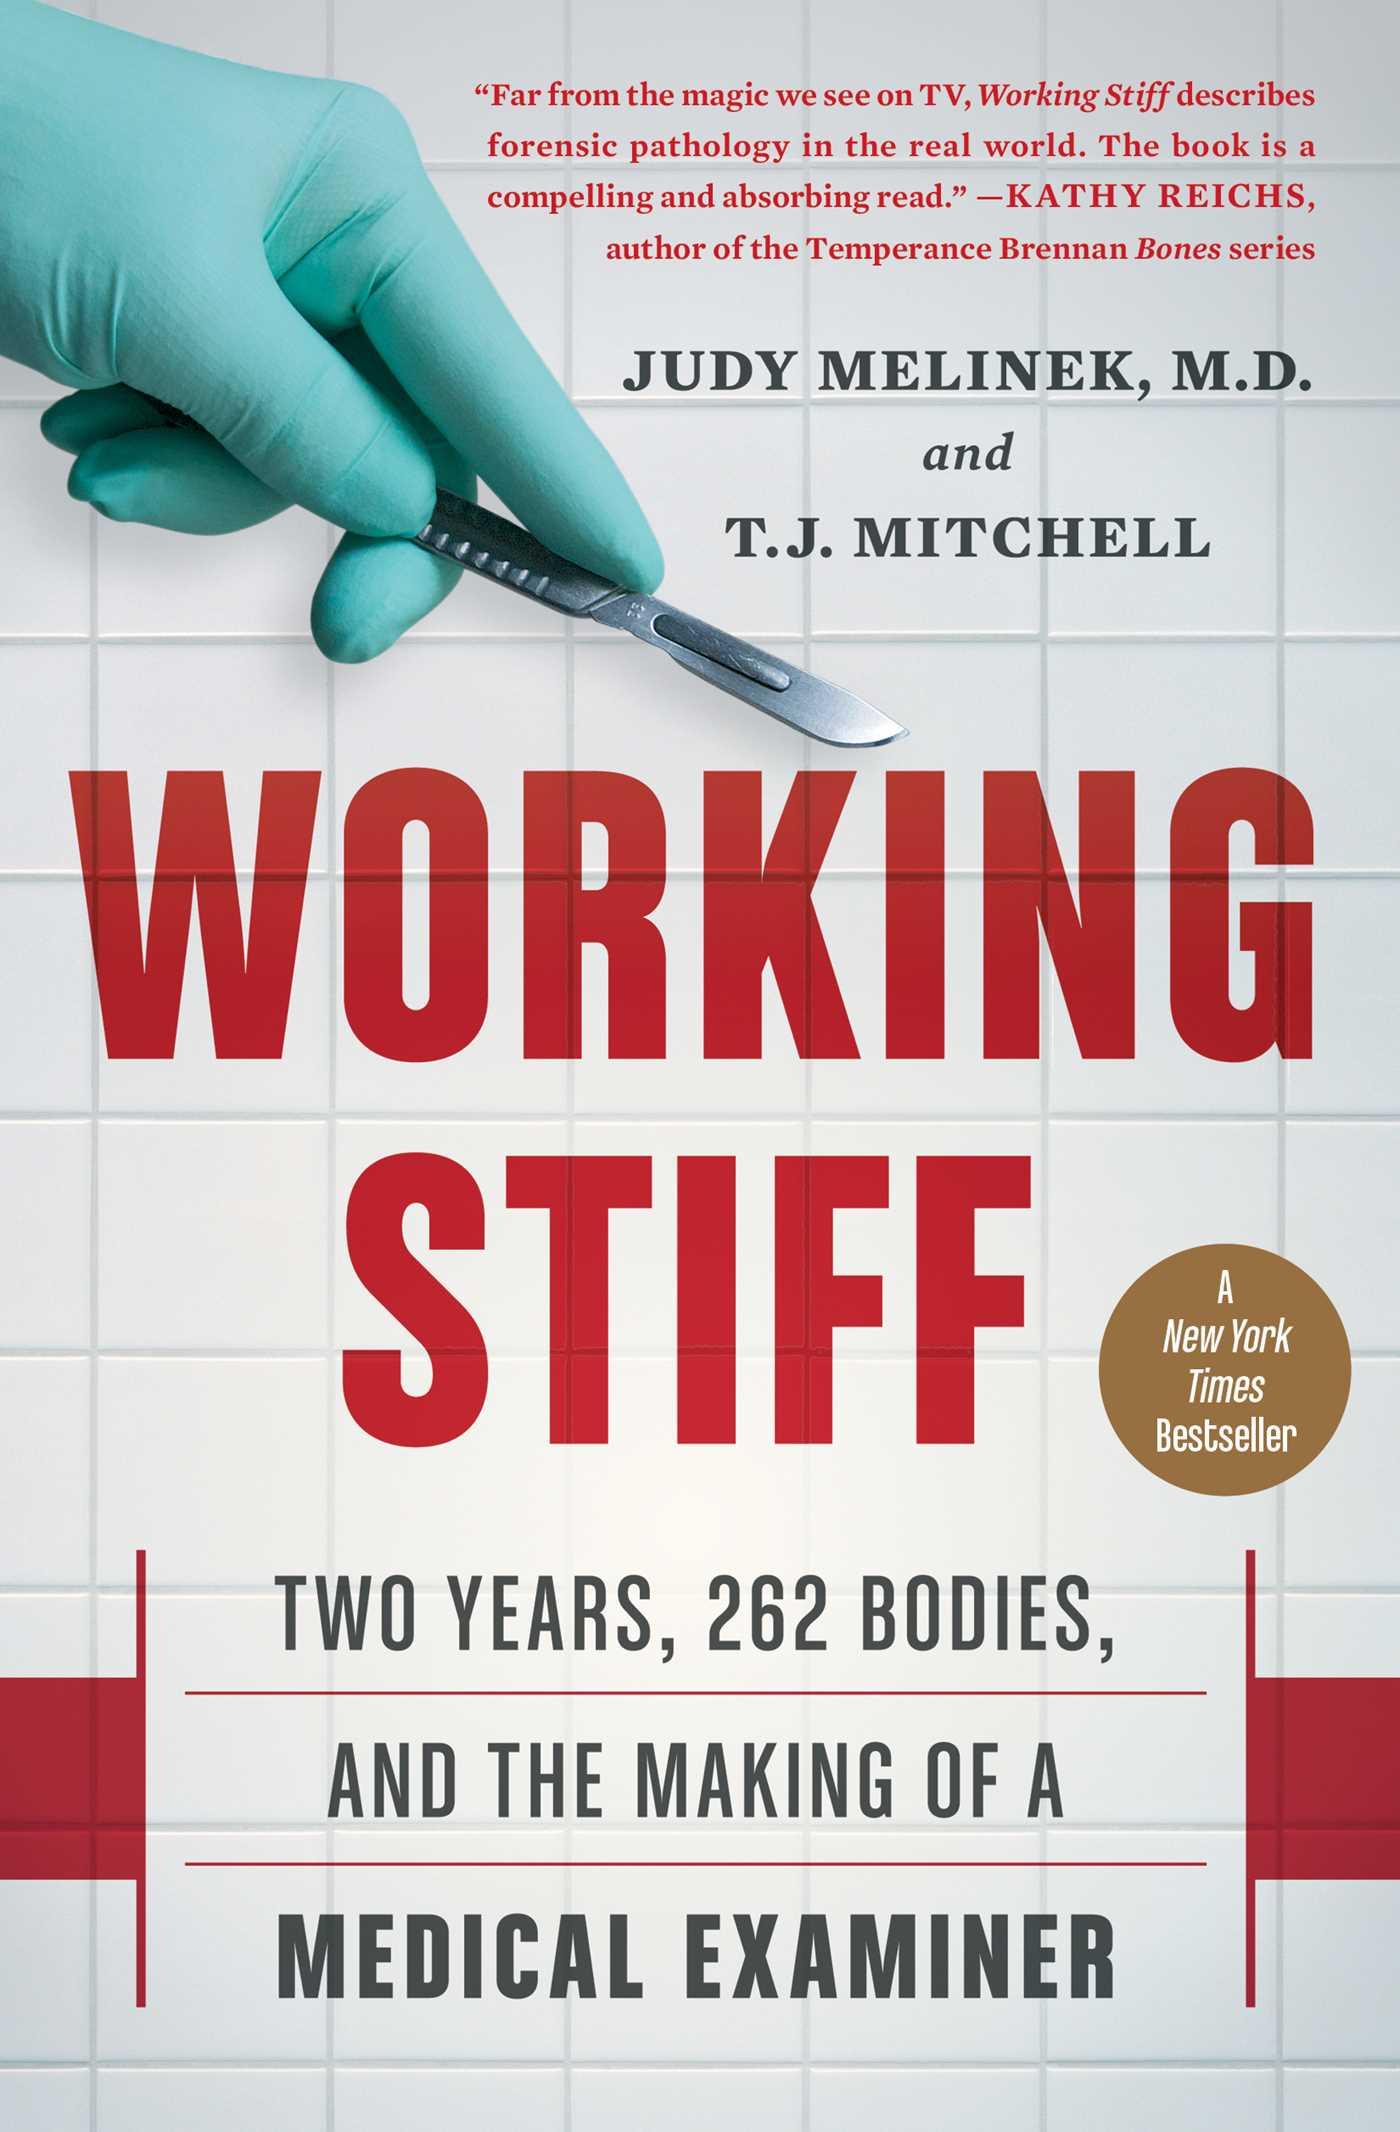 Working Stiff by Dr. Judy Melinek